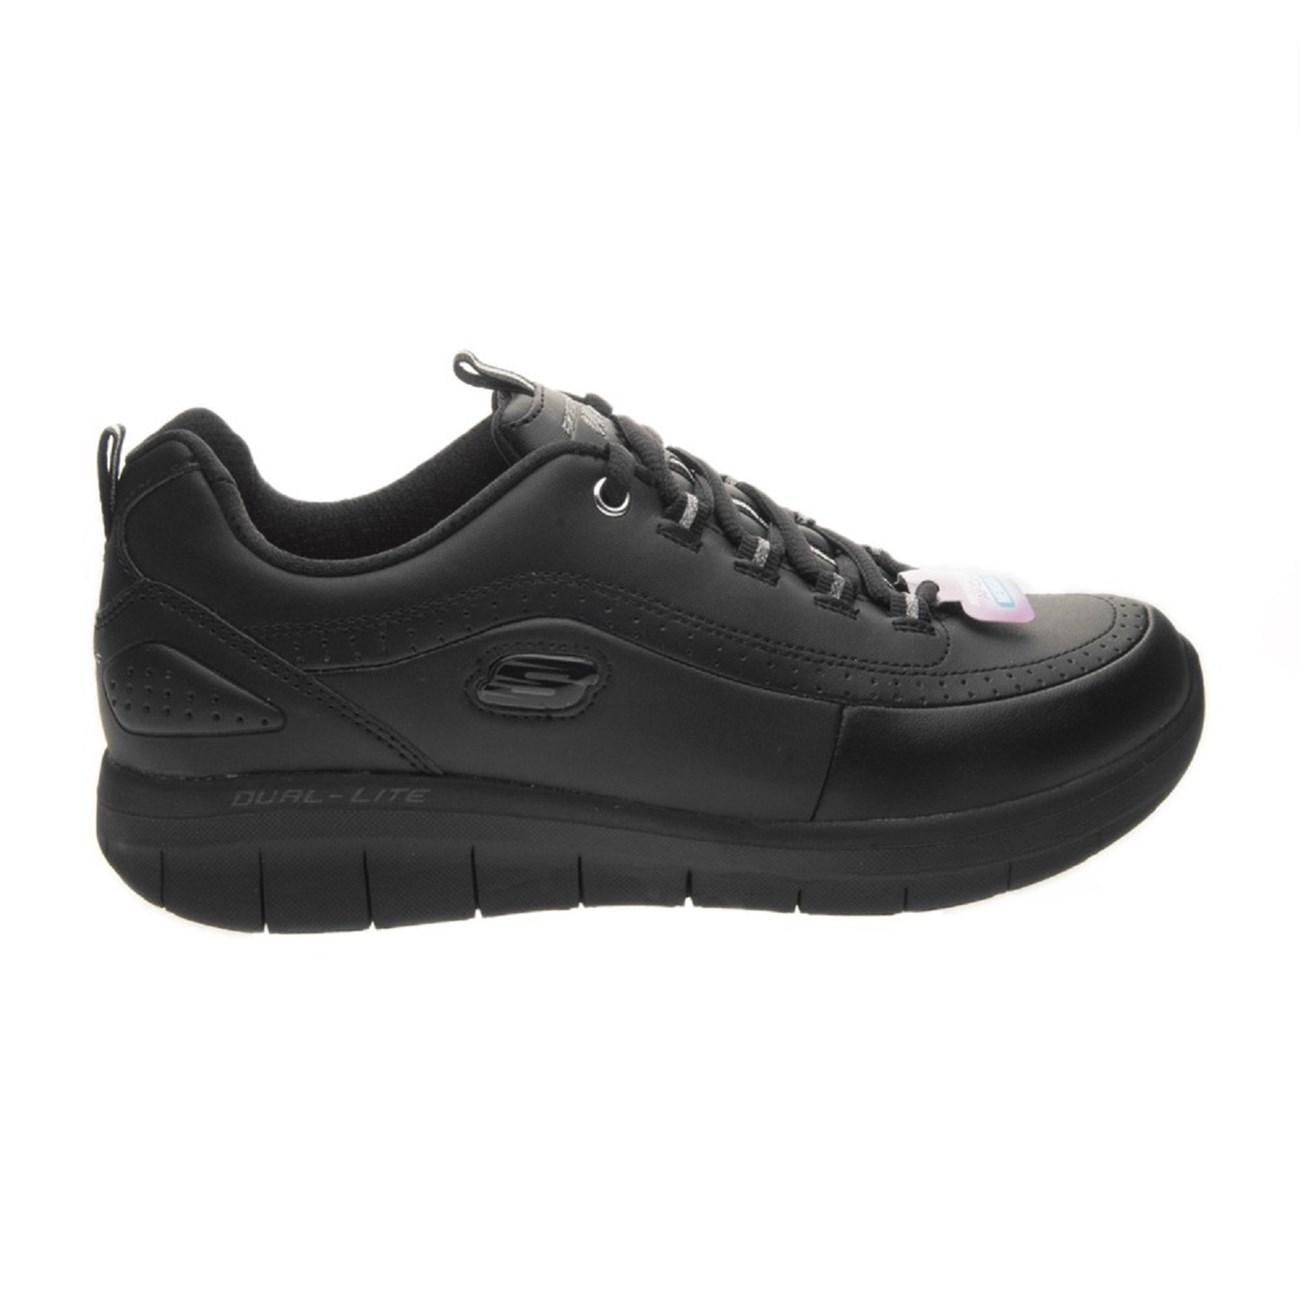 SKECHERS SYNERGY 2.0 W   Παπούτσια για Τρέξιμο  0f322516bb1